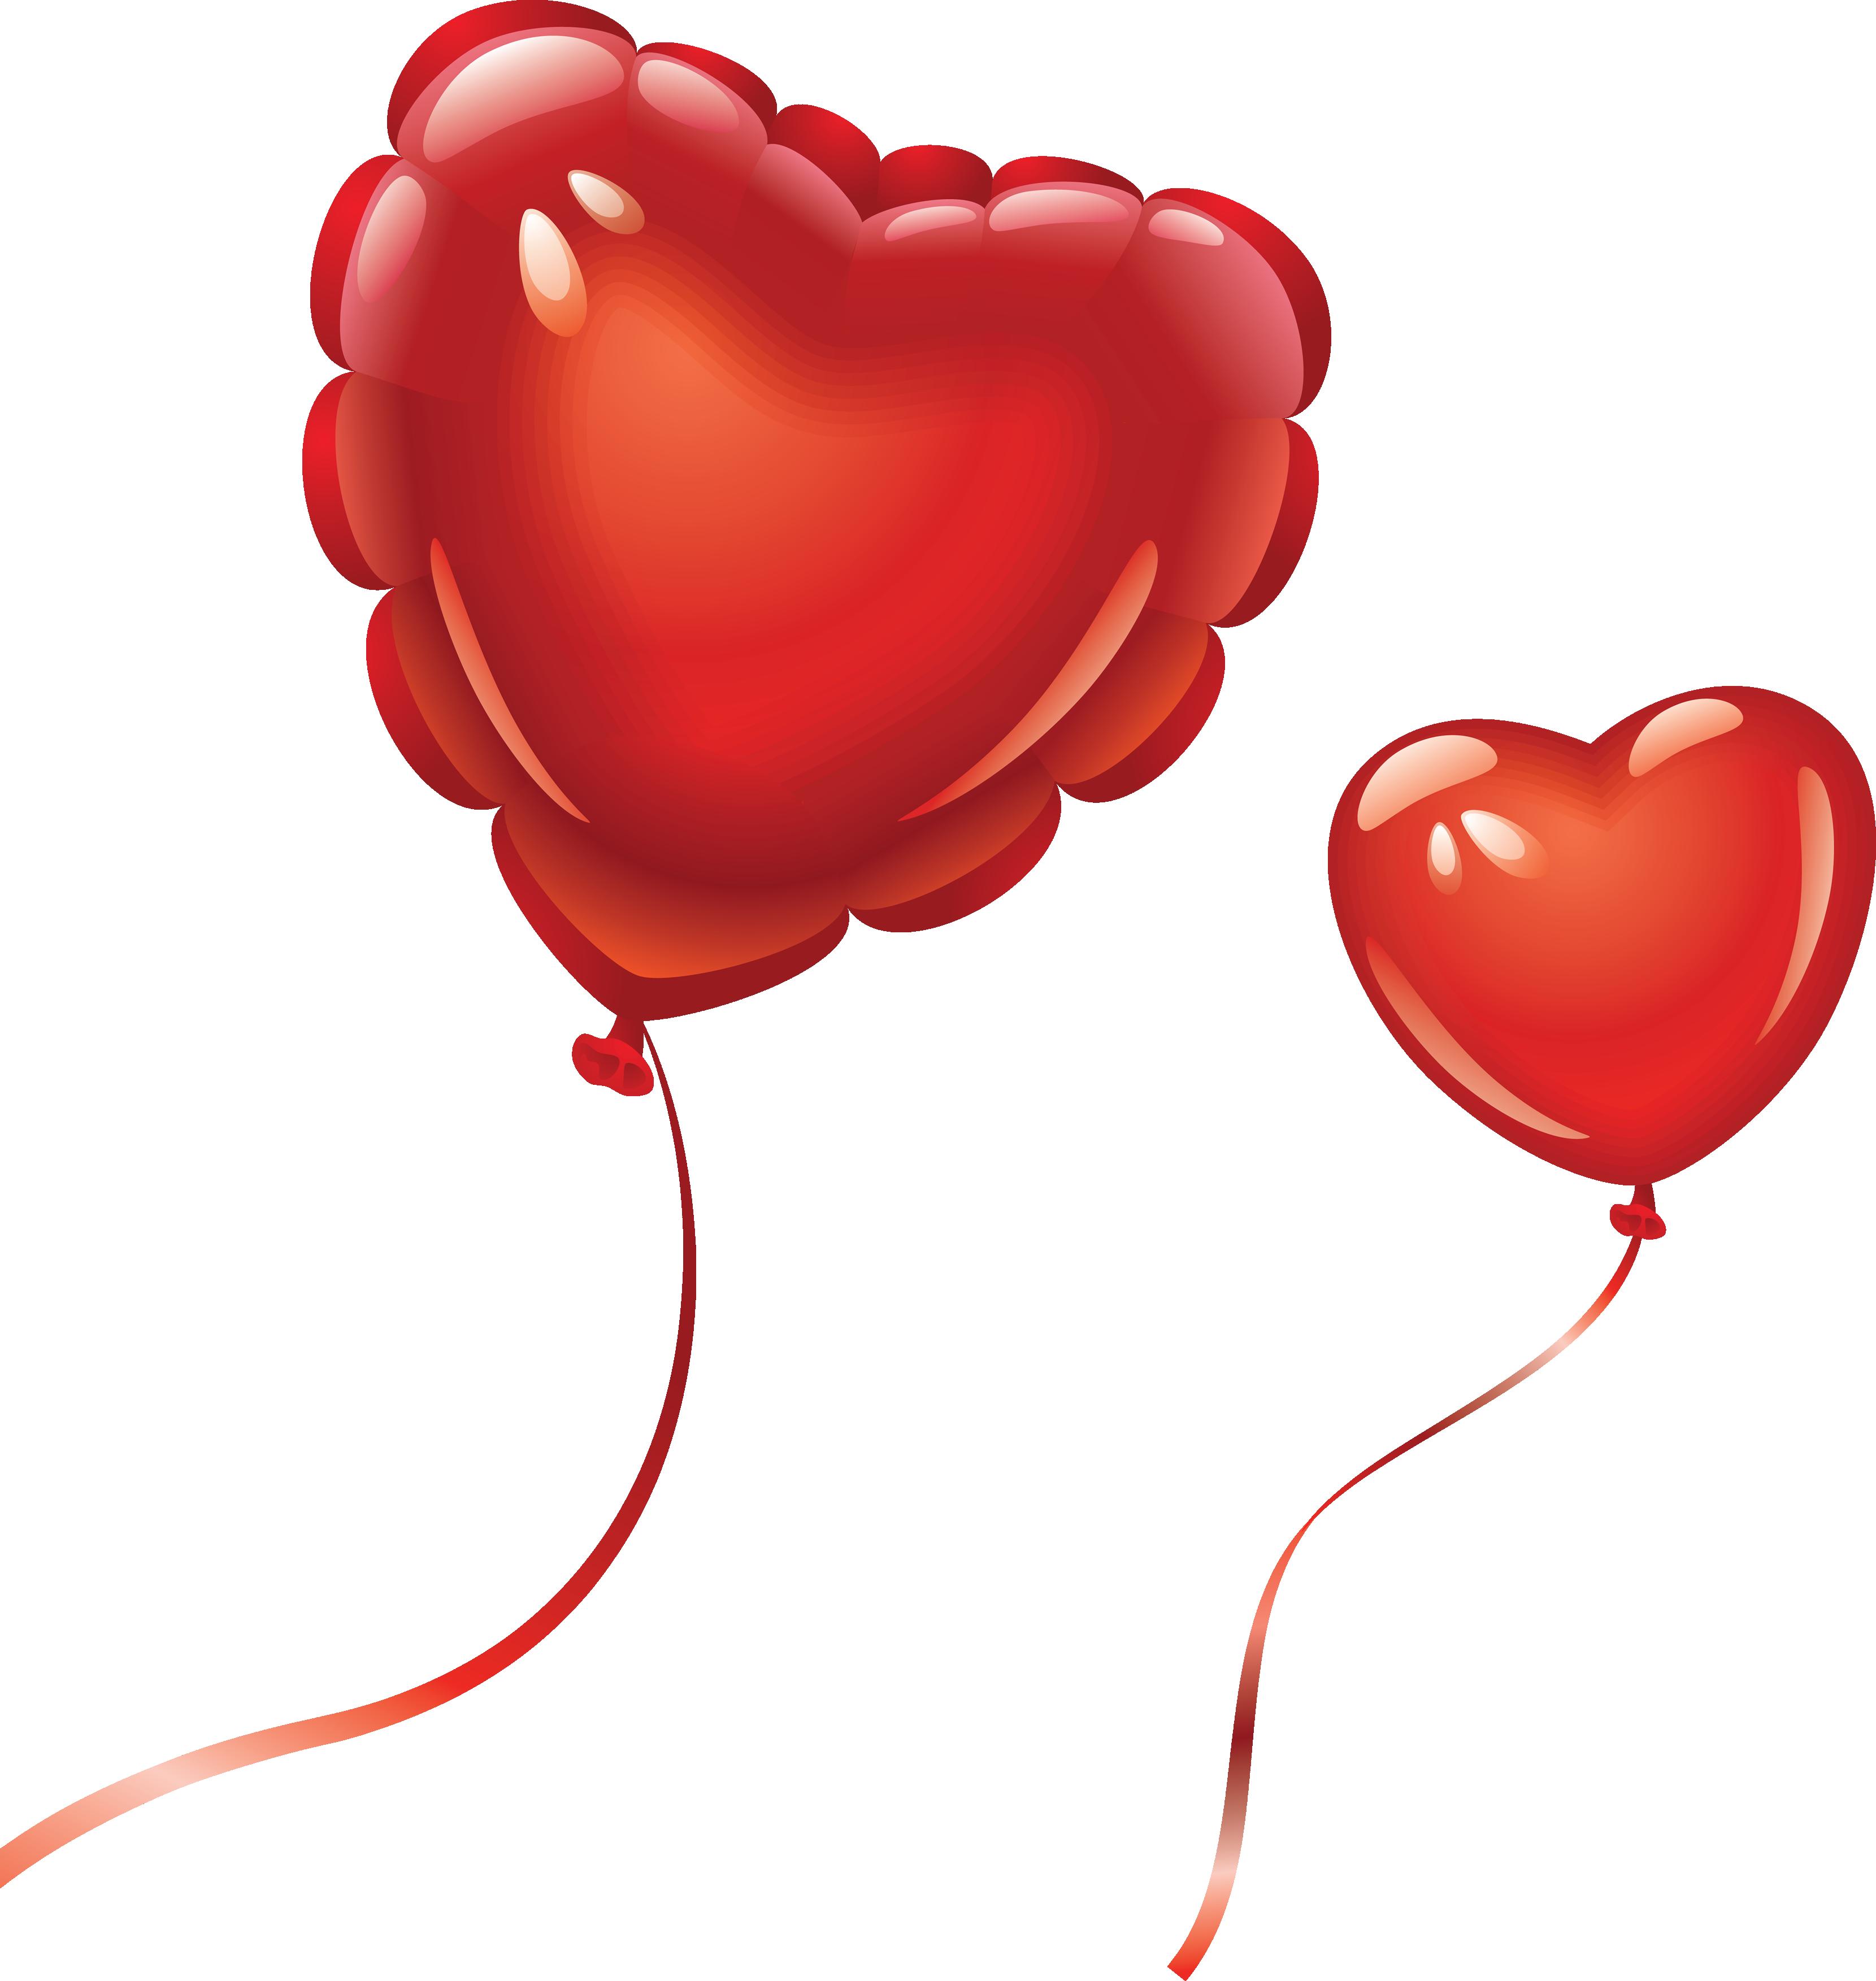 desktop wallpaper valentine heart balloons - photo #35